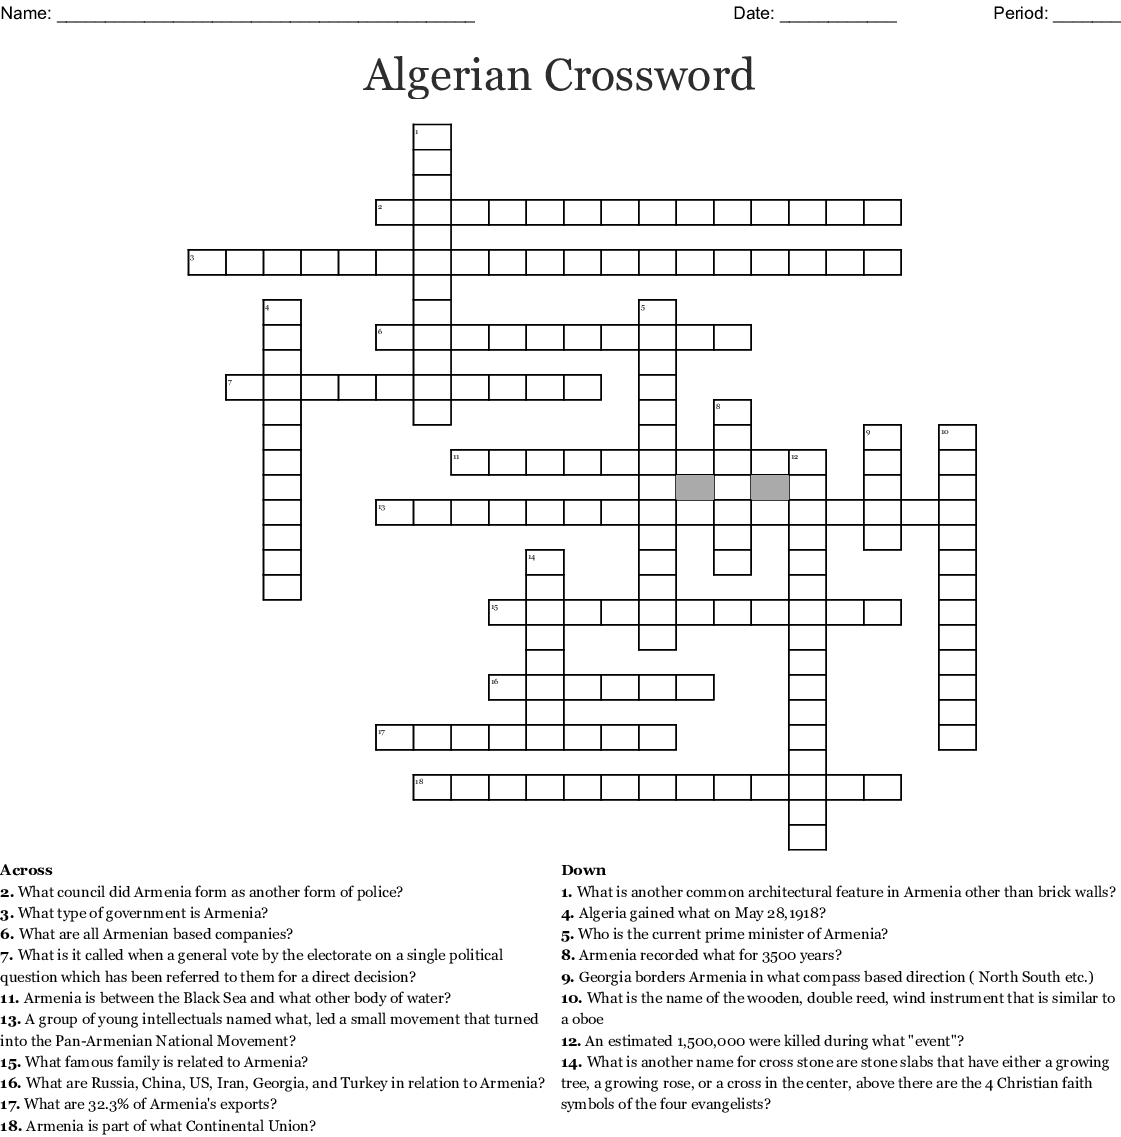 Algerian Crossword